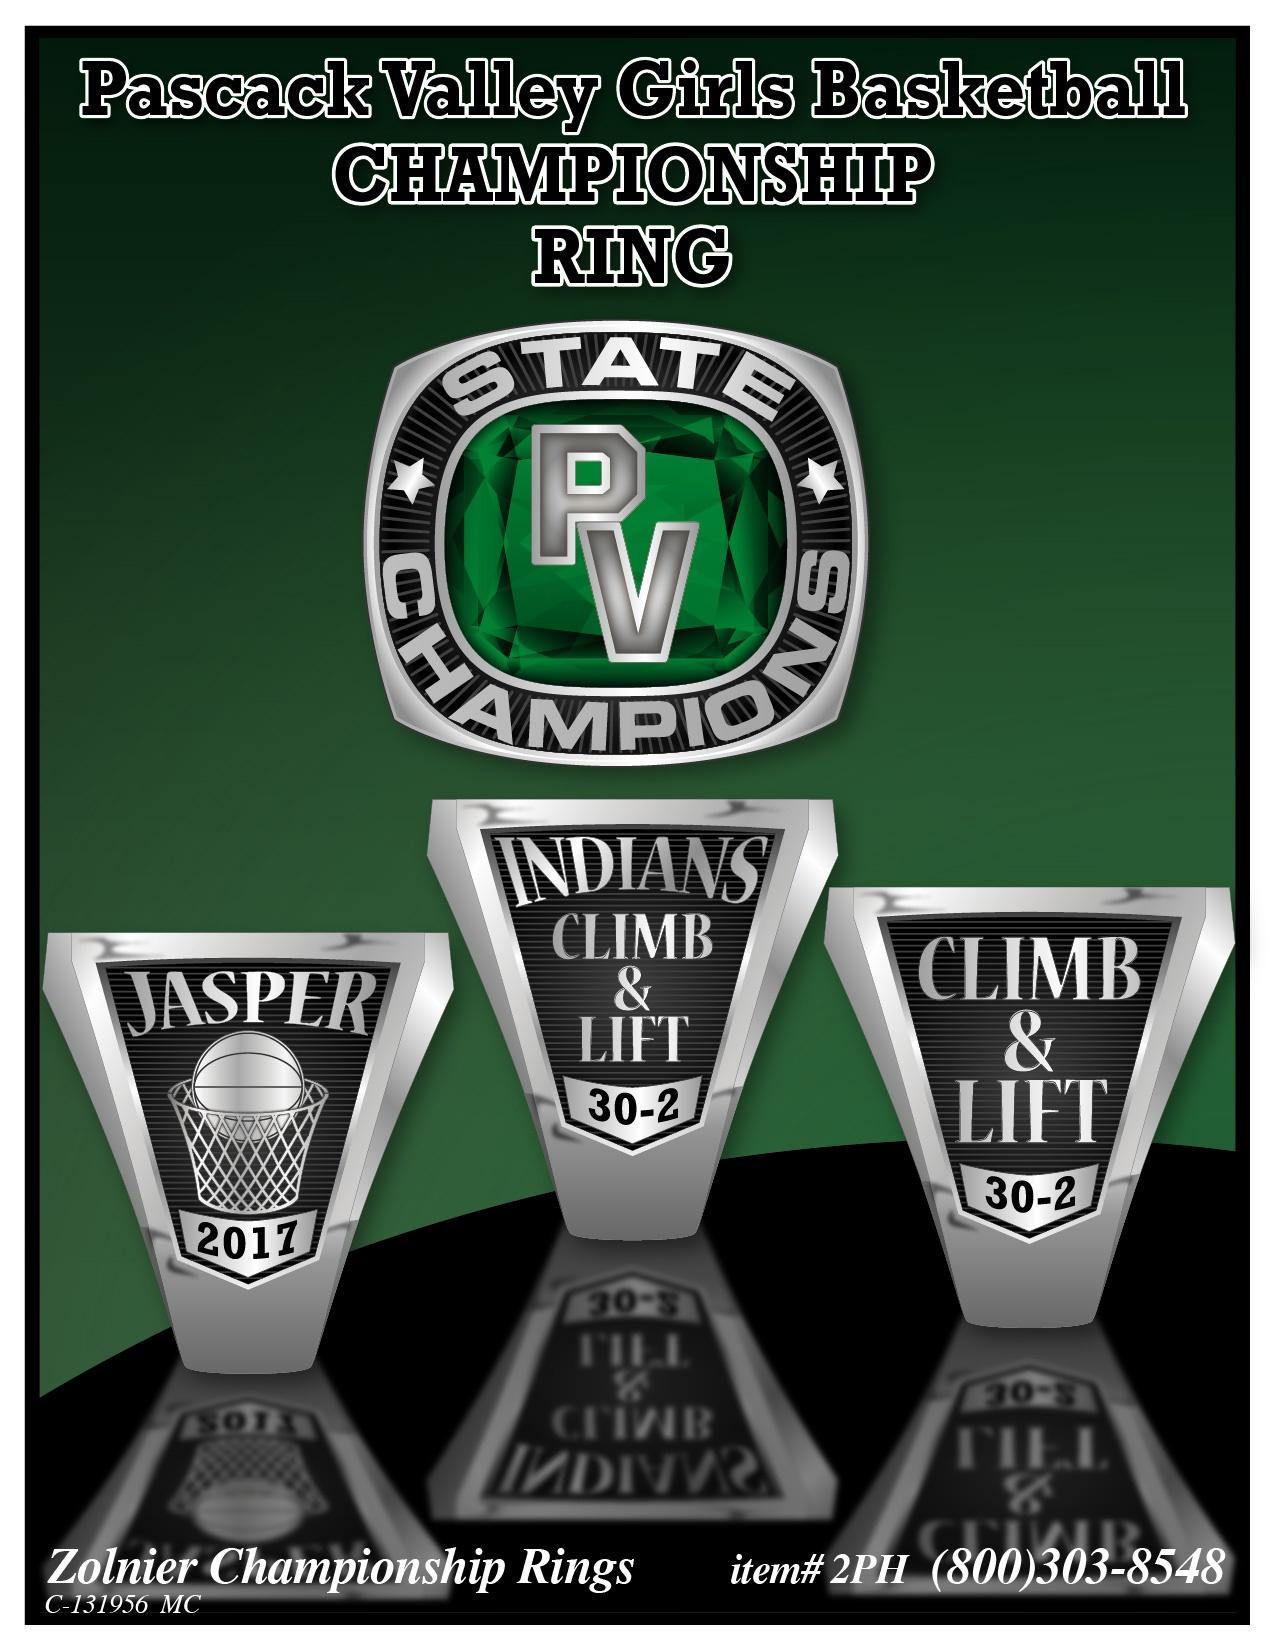 C-131956 Pascack Valley Girls Basketball Championship Ring 1